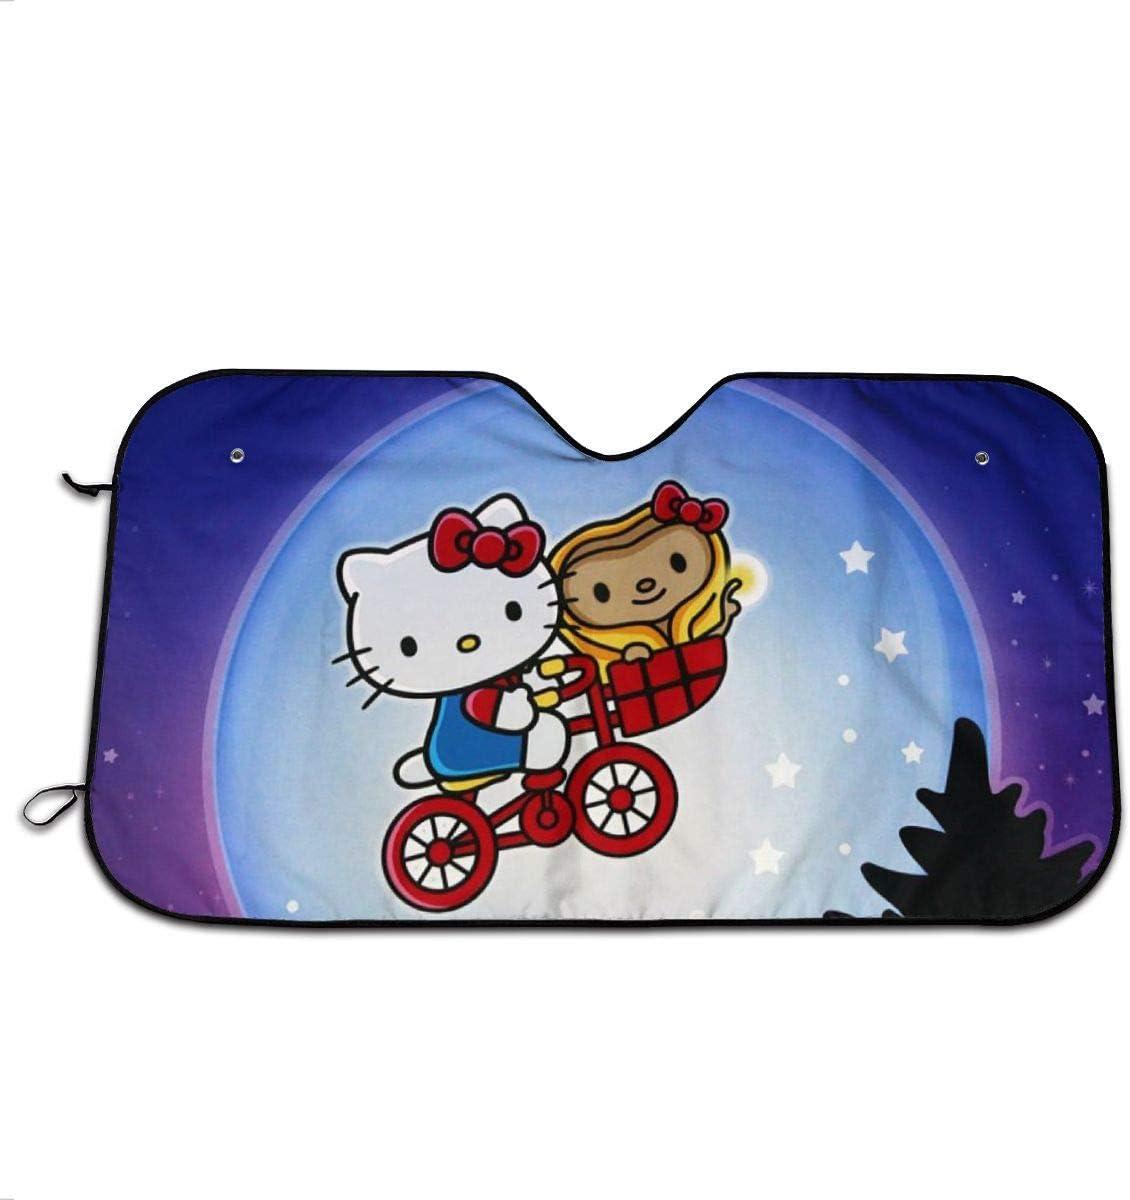 CHLING Windshield Sun Shade Hello Kitty Witn Moon Car Window Shade to Keeps Your Vehicle Cool Heat Shield Shade